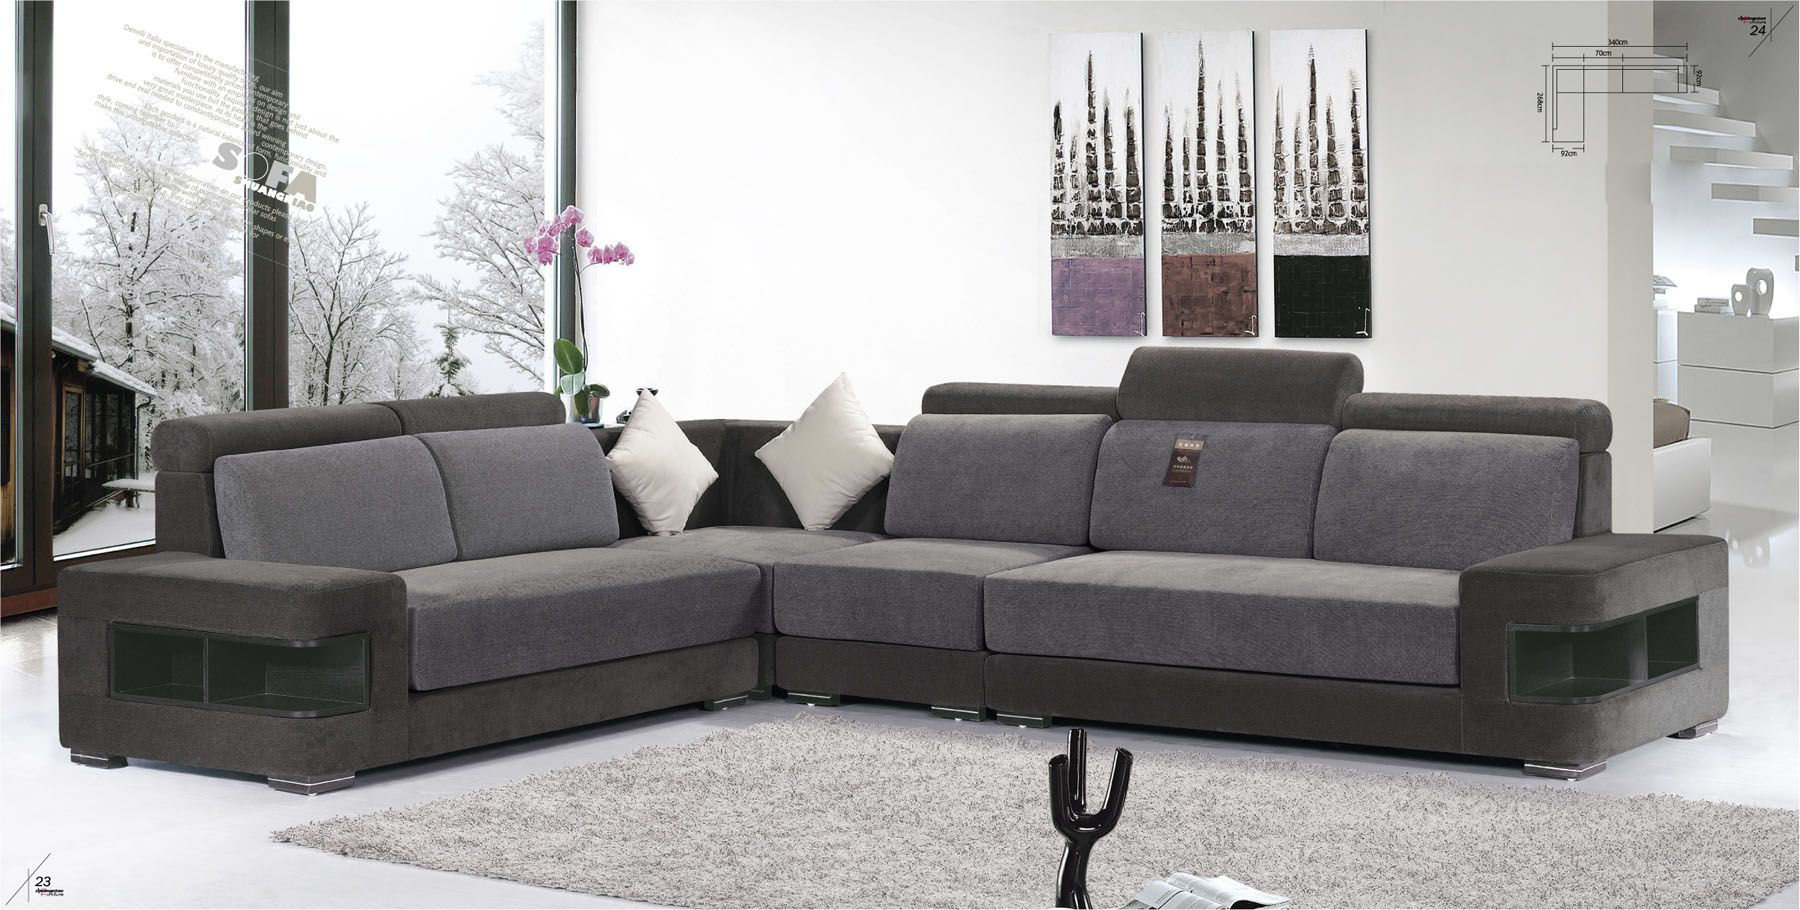 L-shaped Sofa Designs